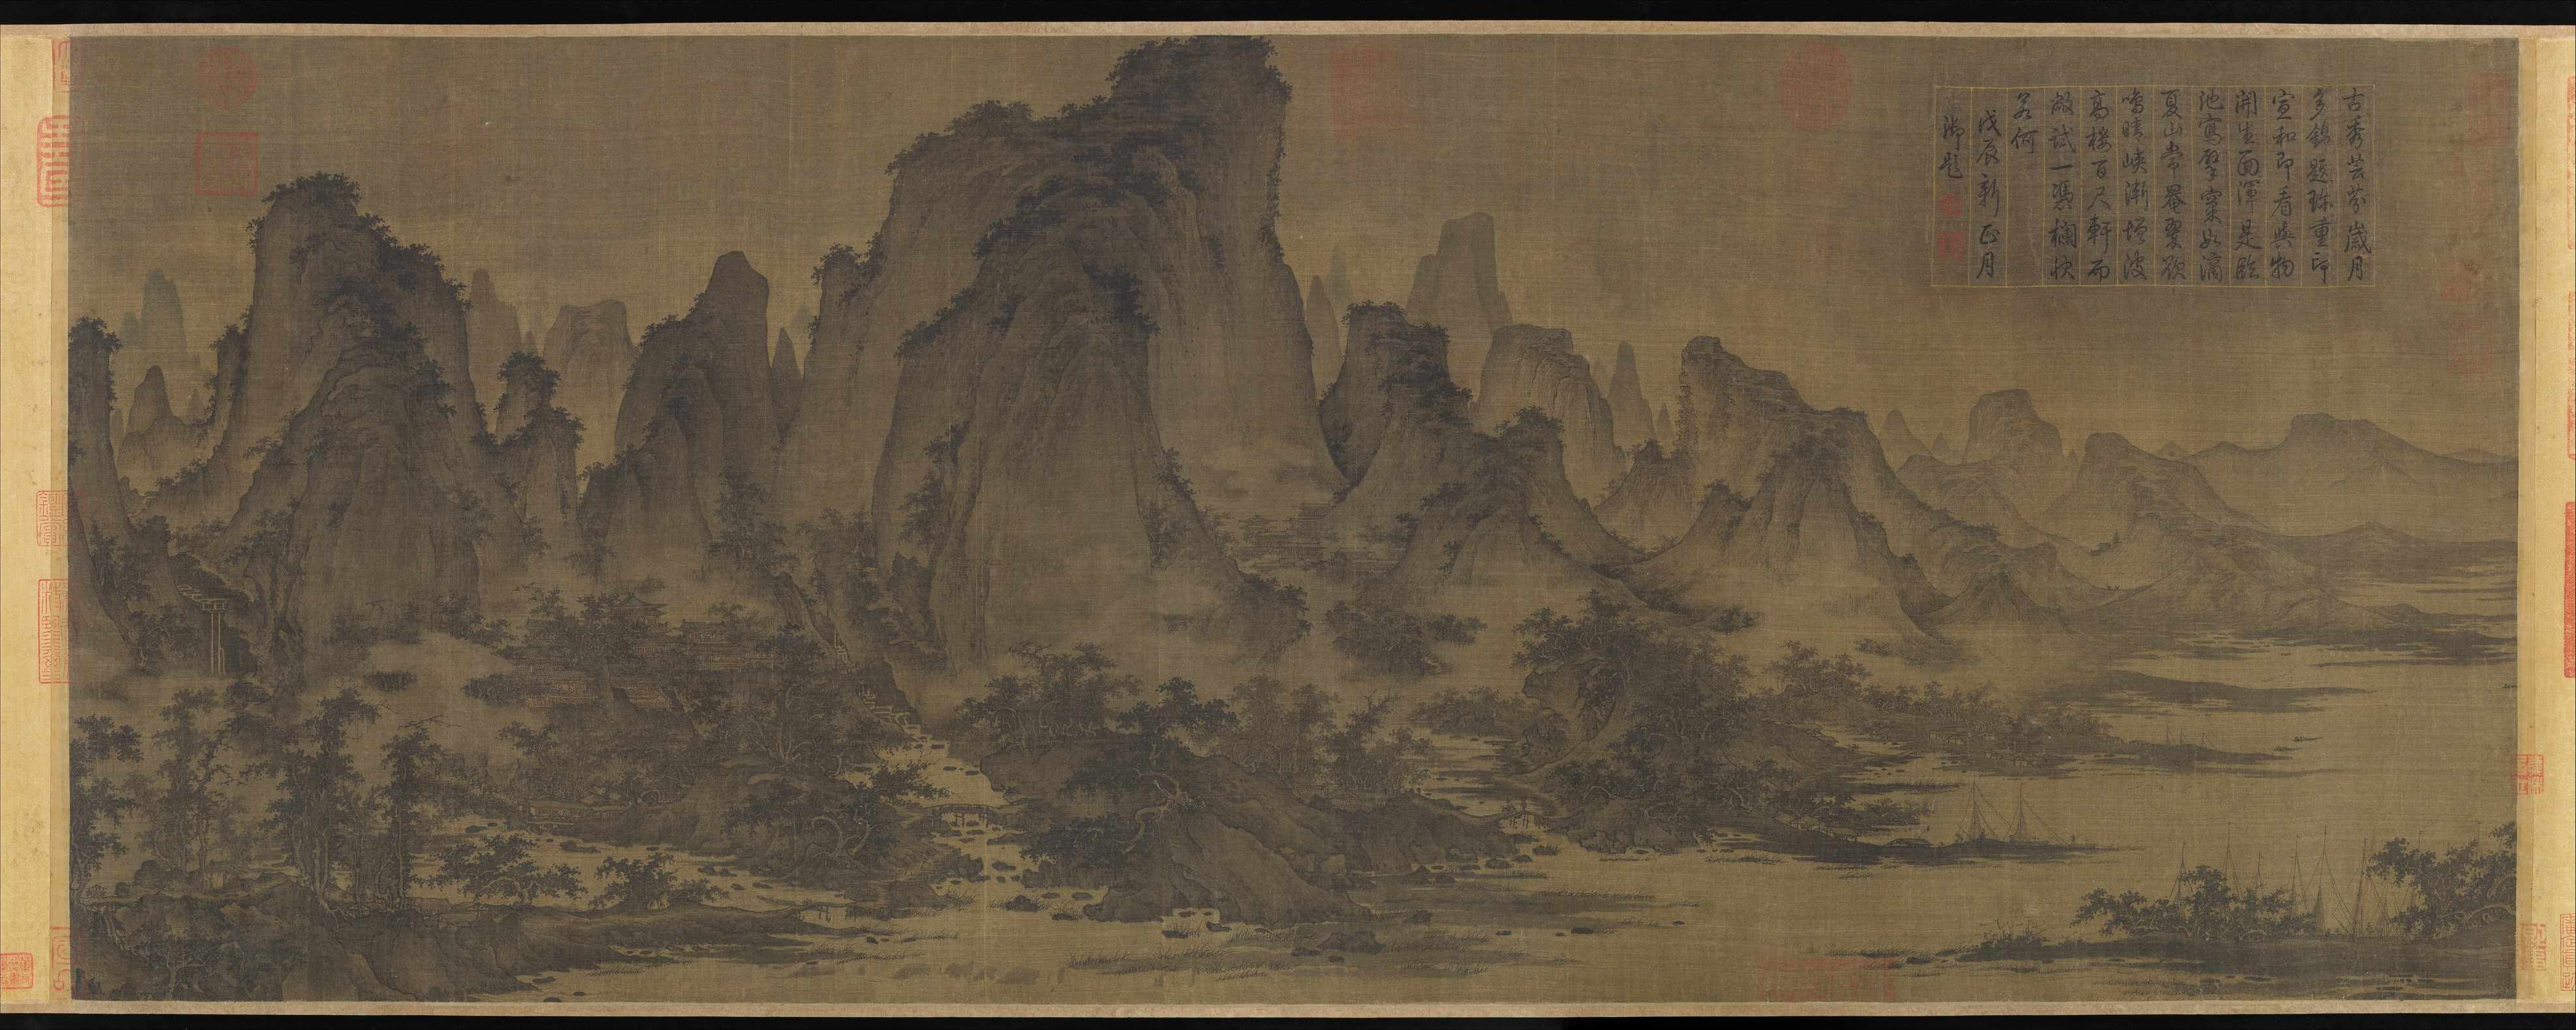 Qu Ding [CC0], via Wikimedia Commons